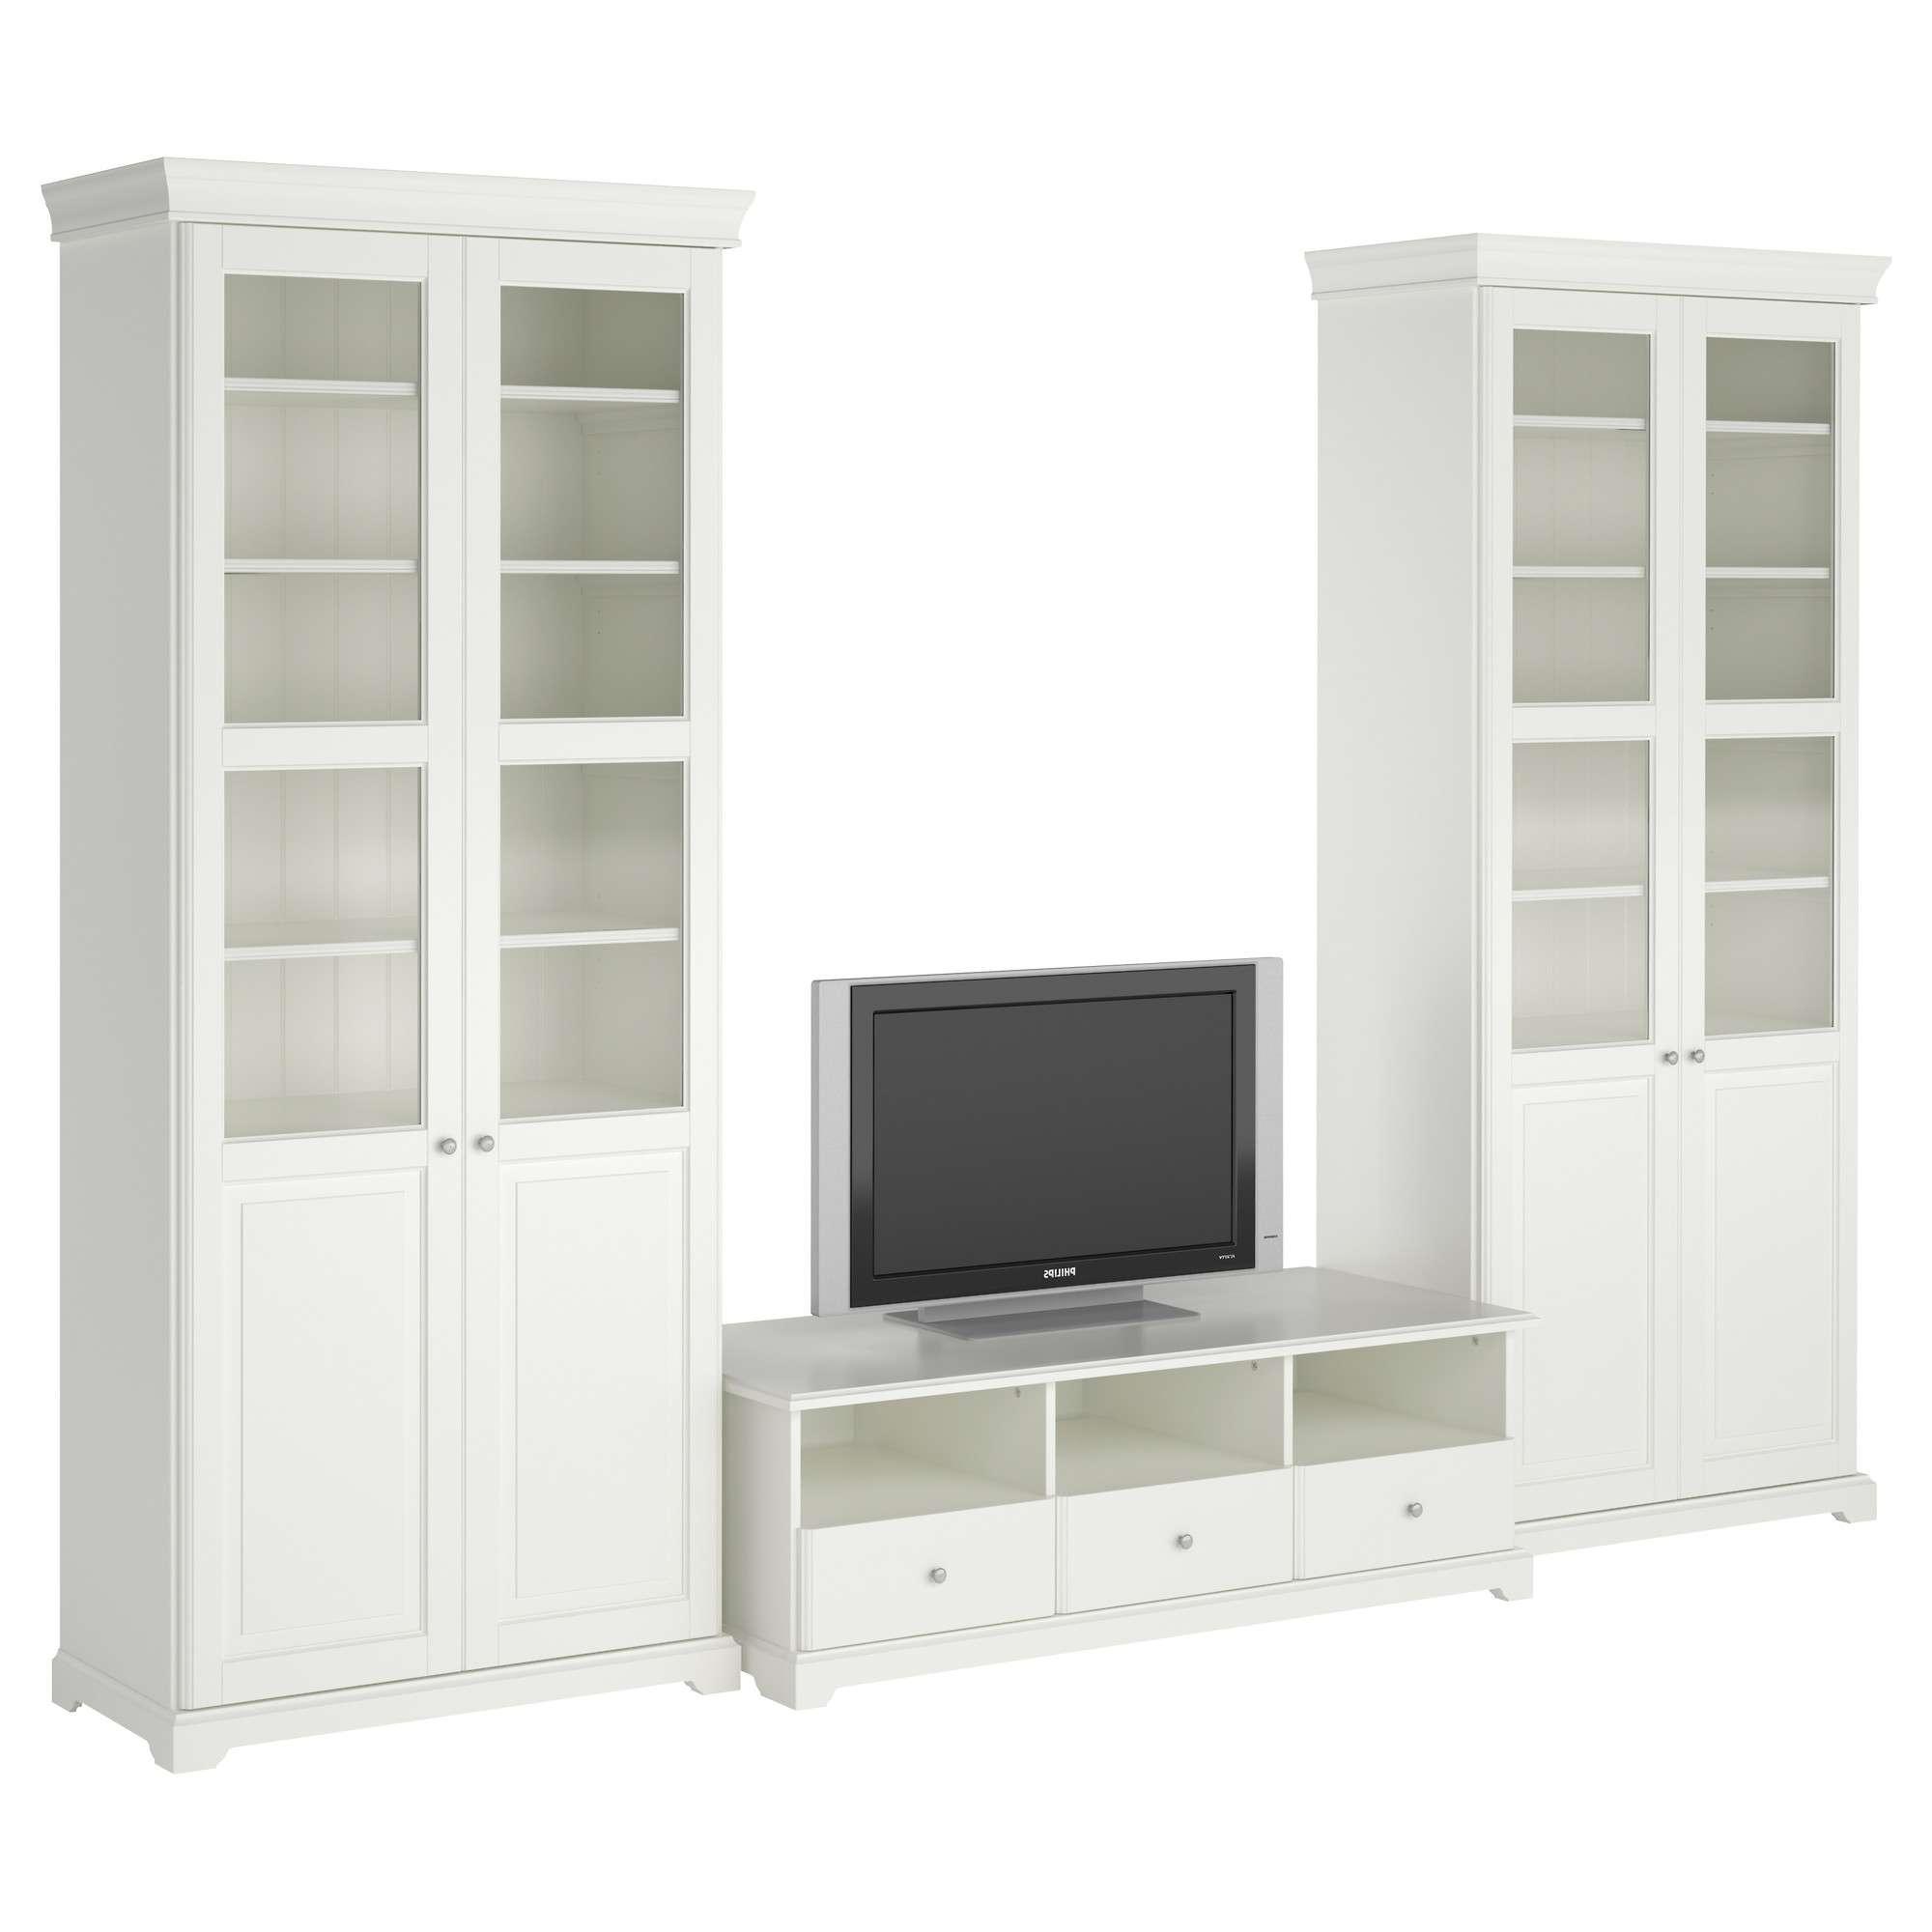 Liatorp Tv Storage Combination White Media Furniture Cm Ikea Spr With Regard To Small White Tv Cabinets (View 18 of 20)